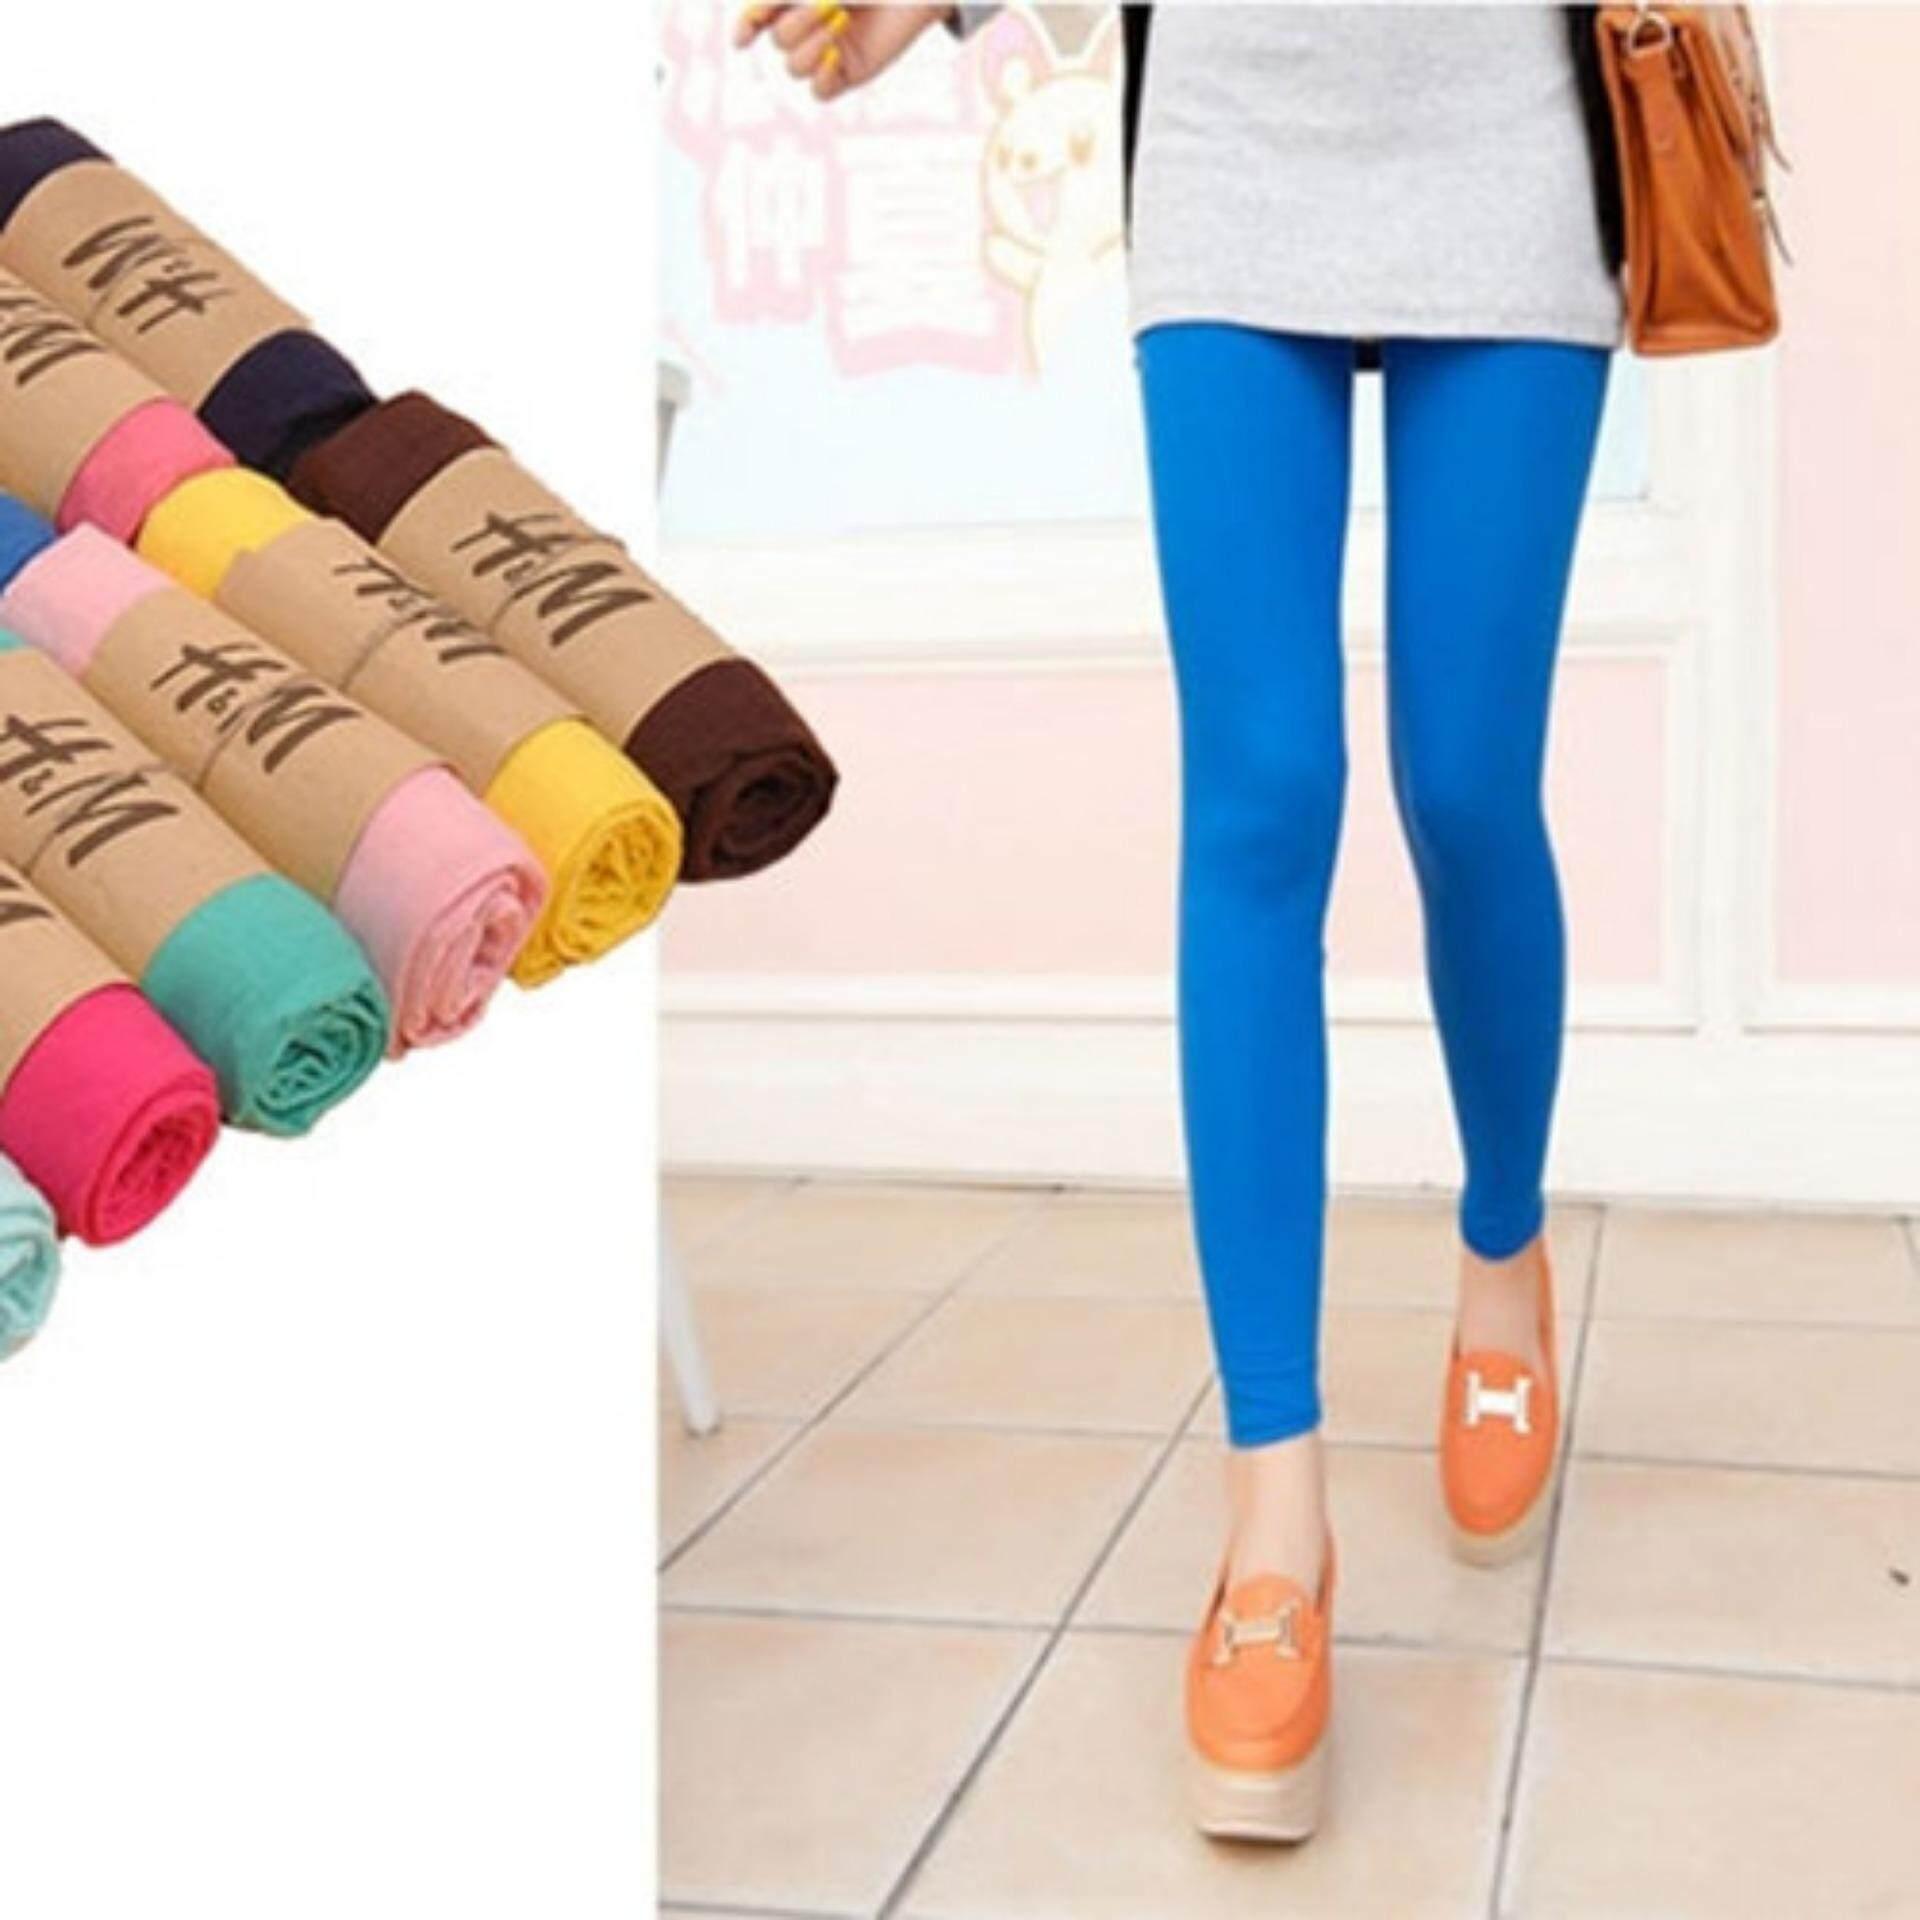 bf091f36929e3 2pcs of Colourful H&M Modal Leggings - Color Random Send